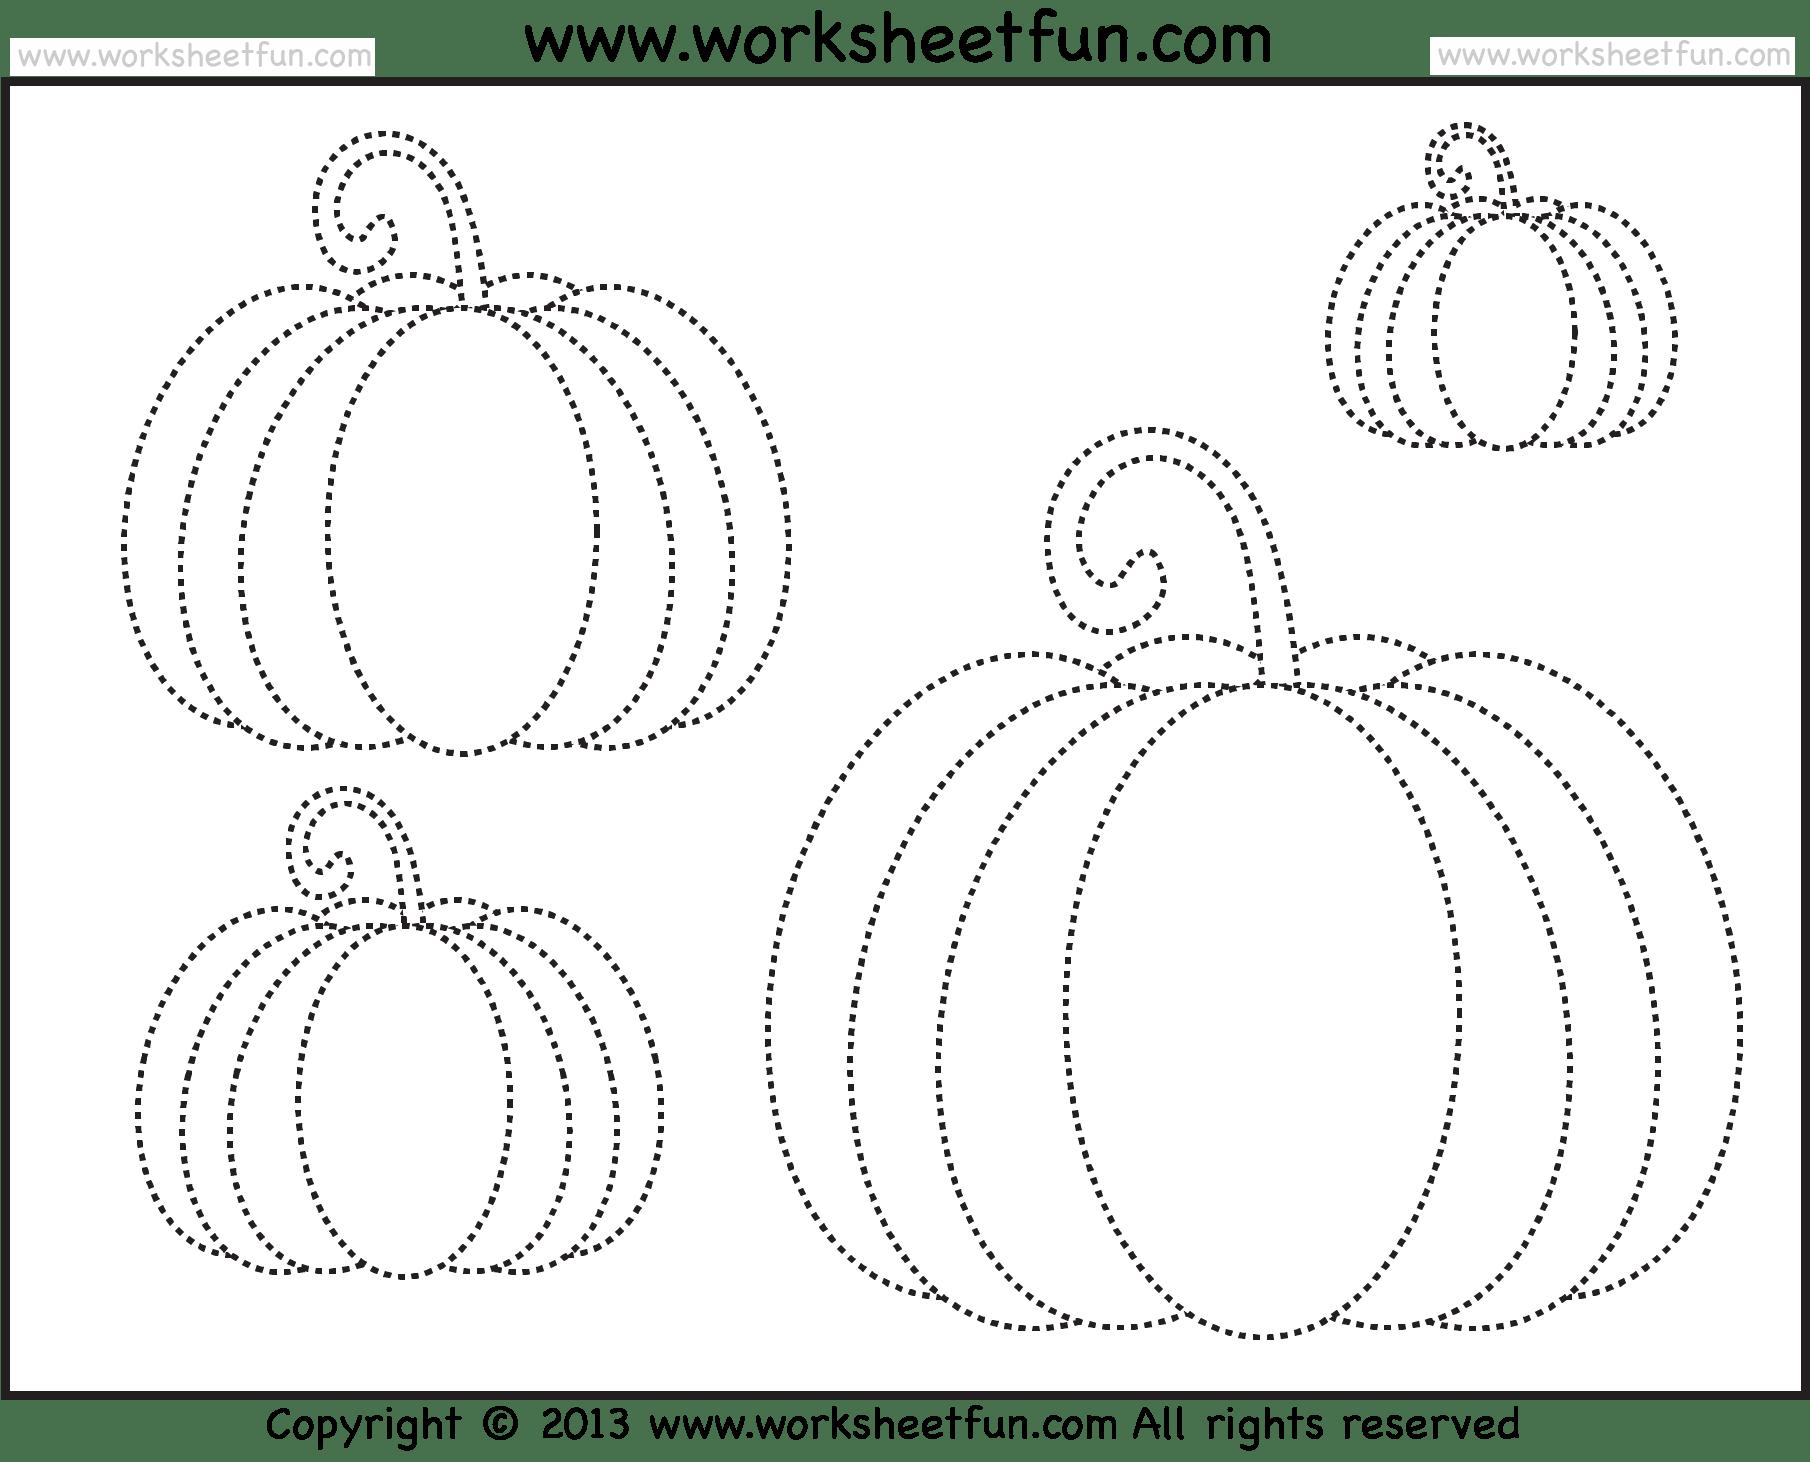 Pumpkin Tracing 3 Worksheets Free Printable Worksheets